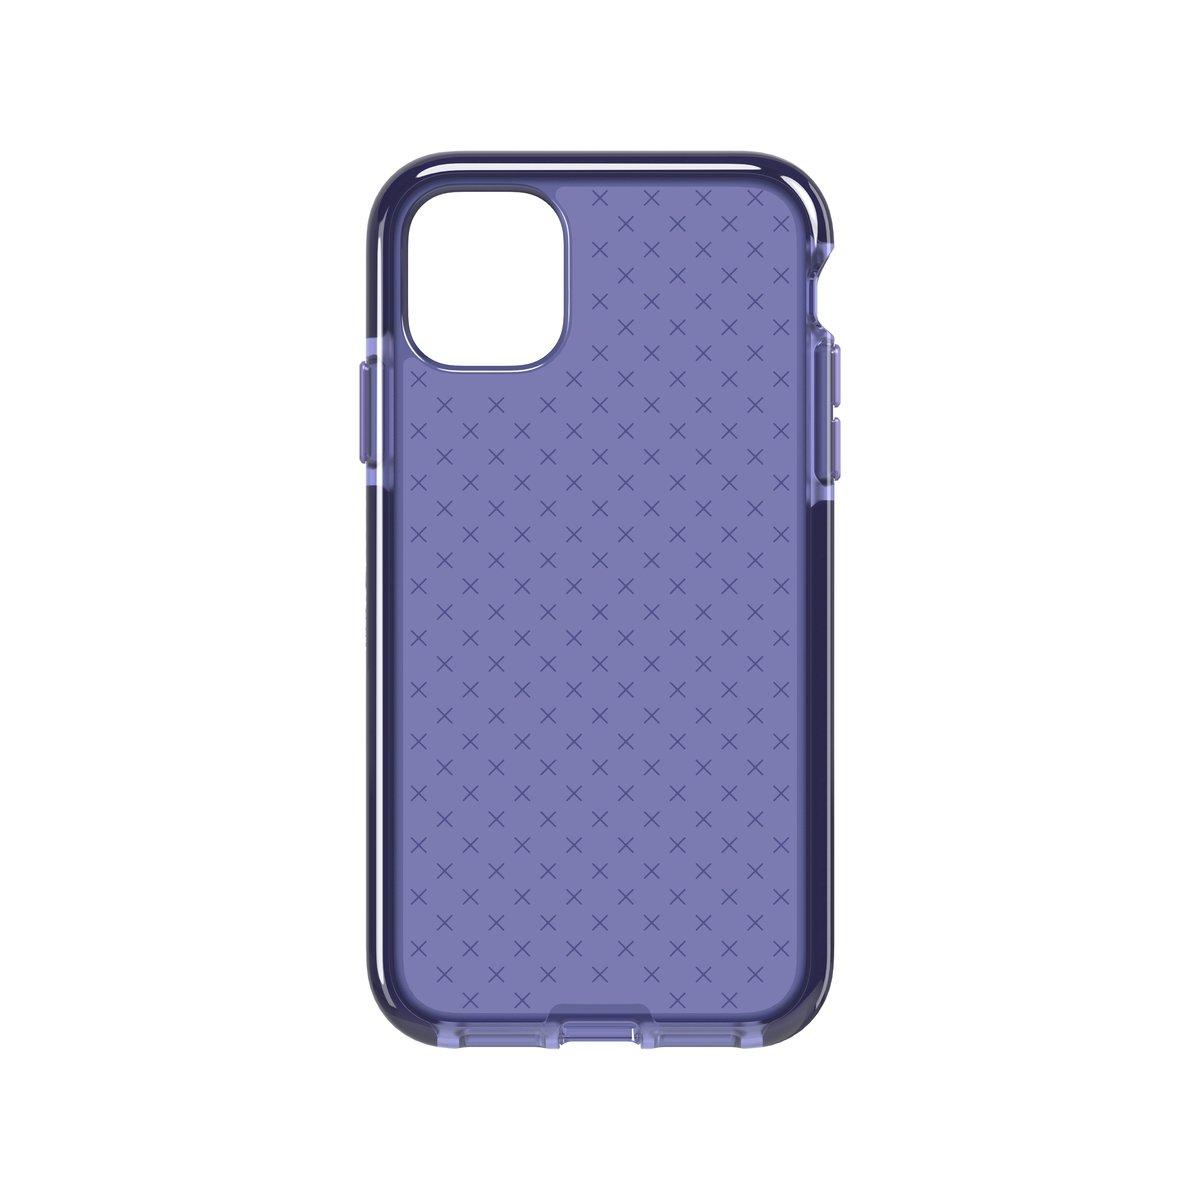 Evo Check for iPhone 11 - Indigo